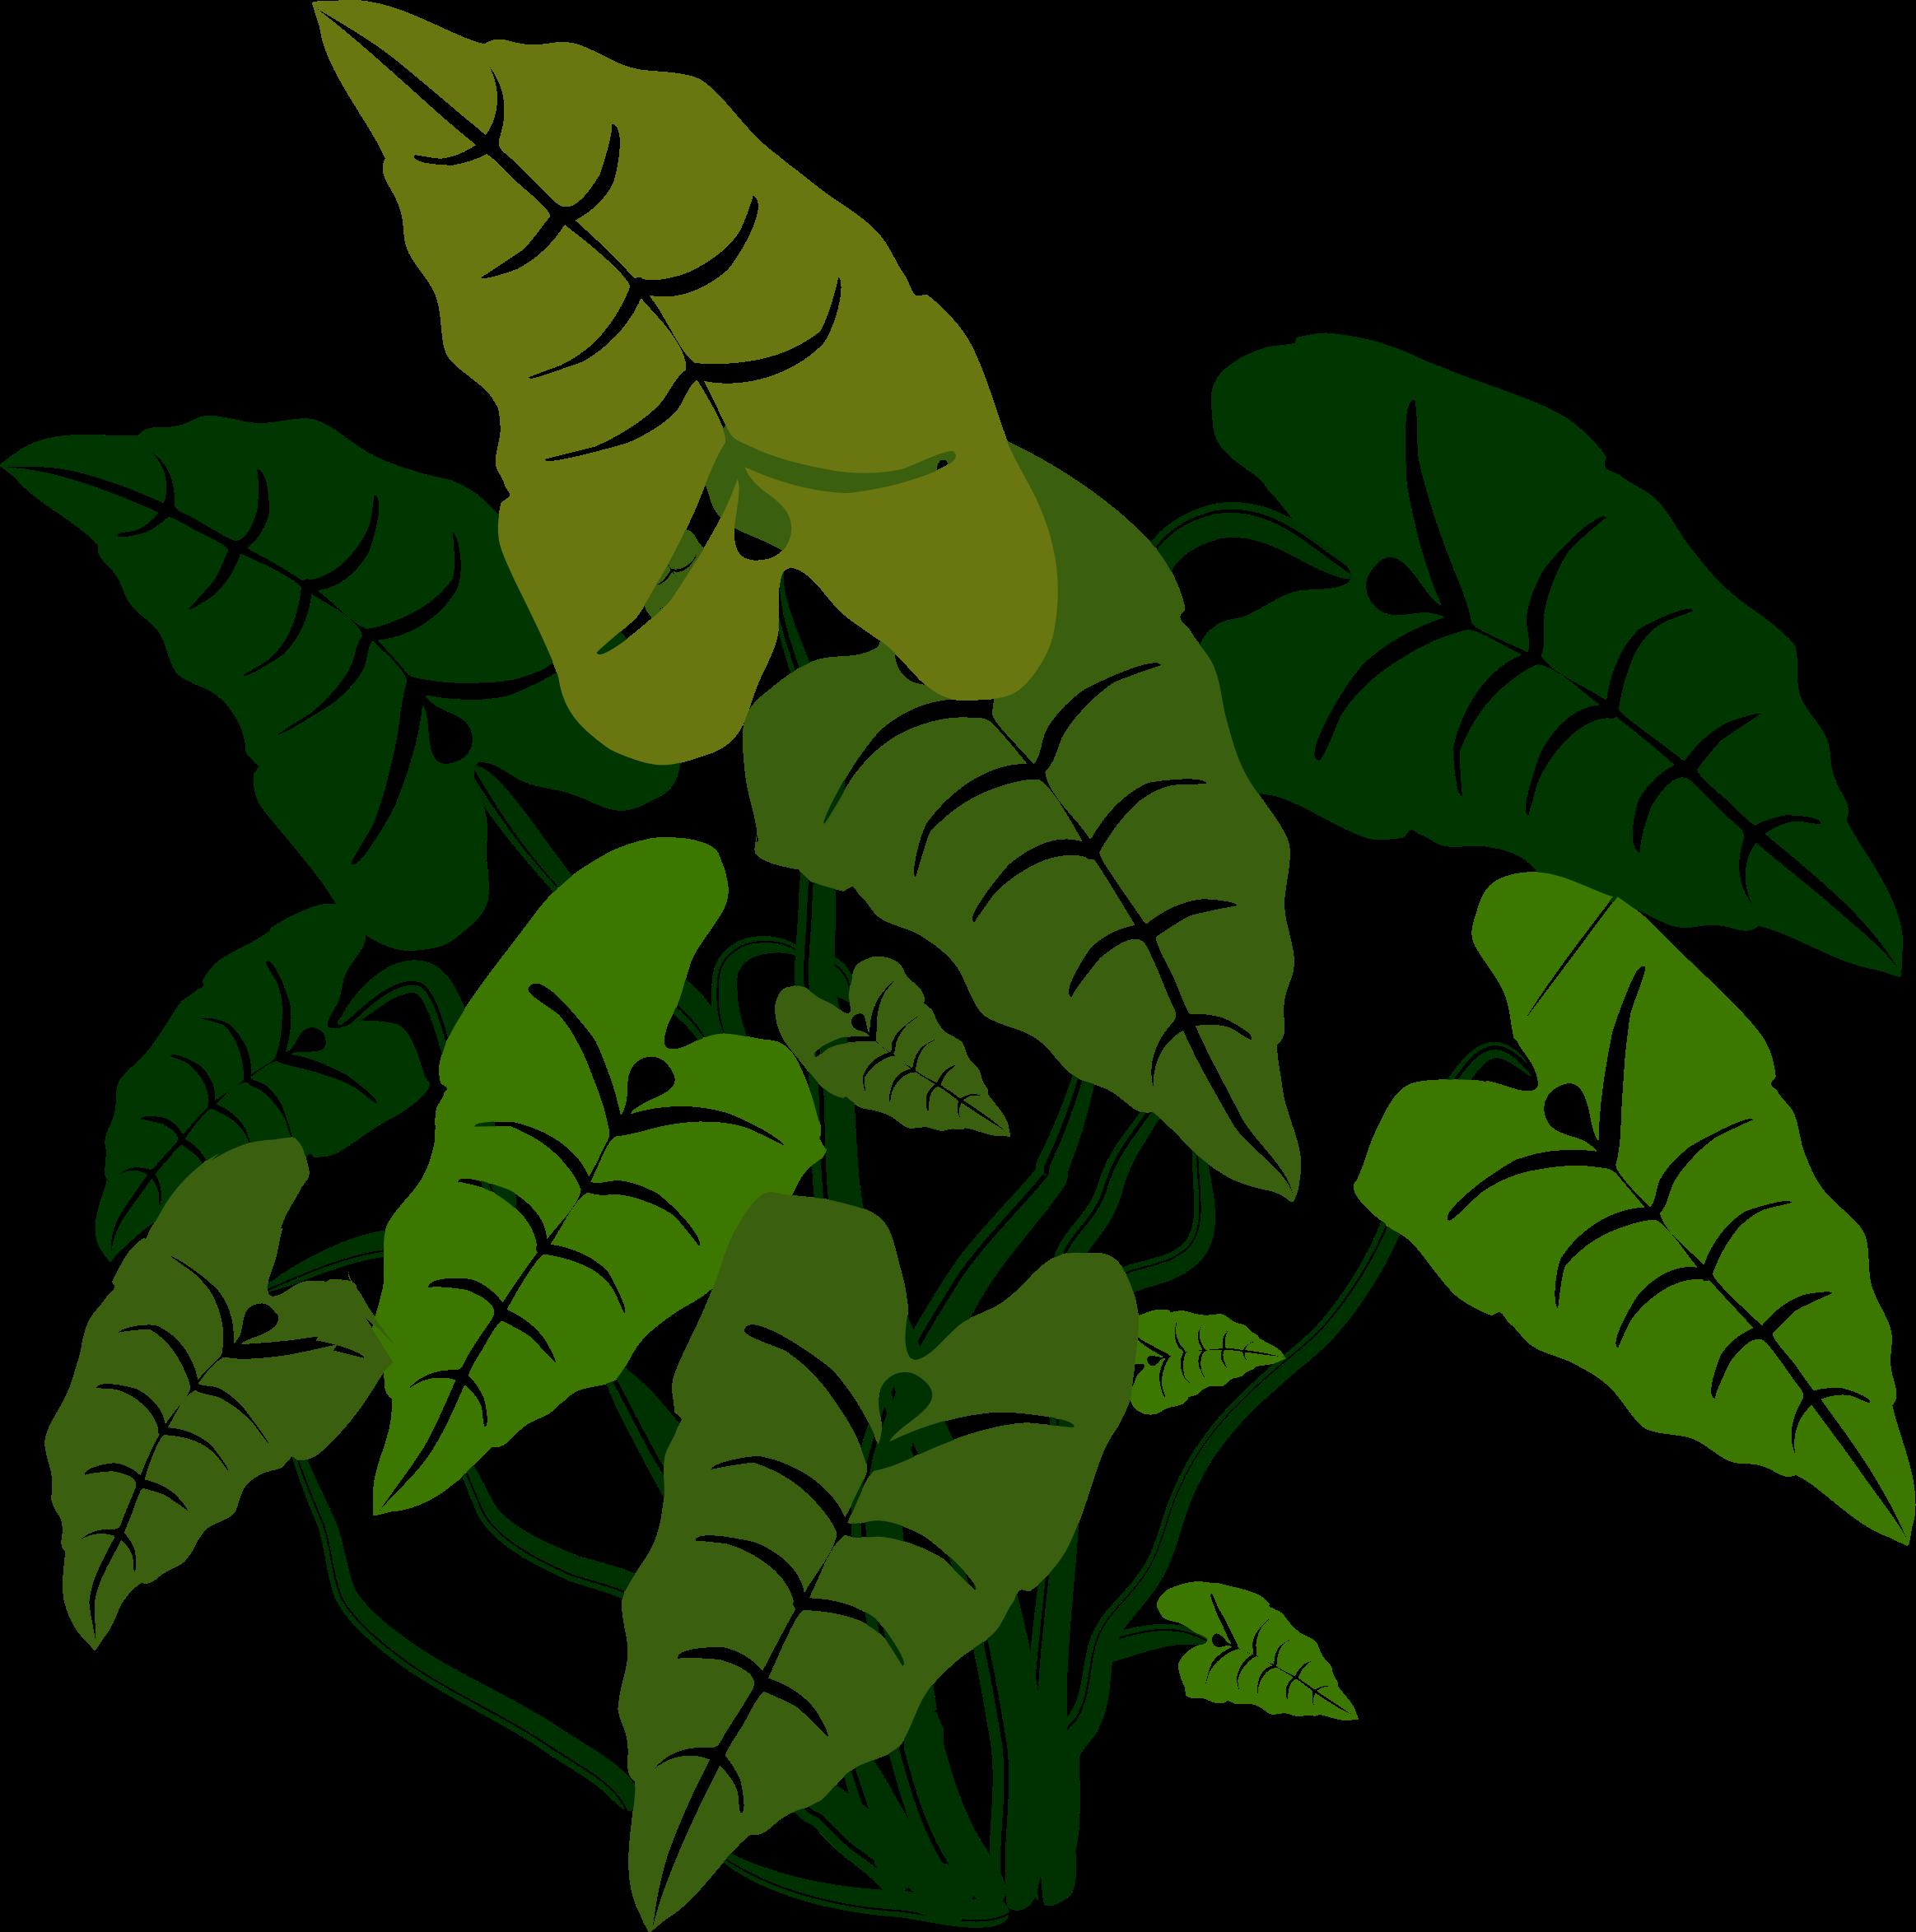 Elephant ears big image. Clipart leaf cactus